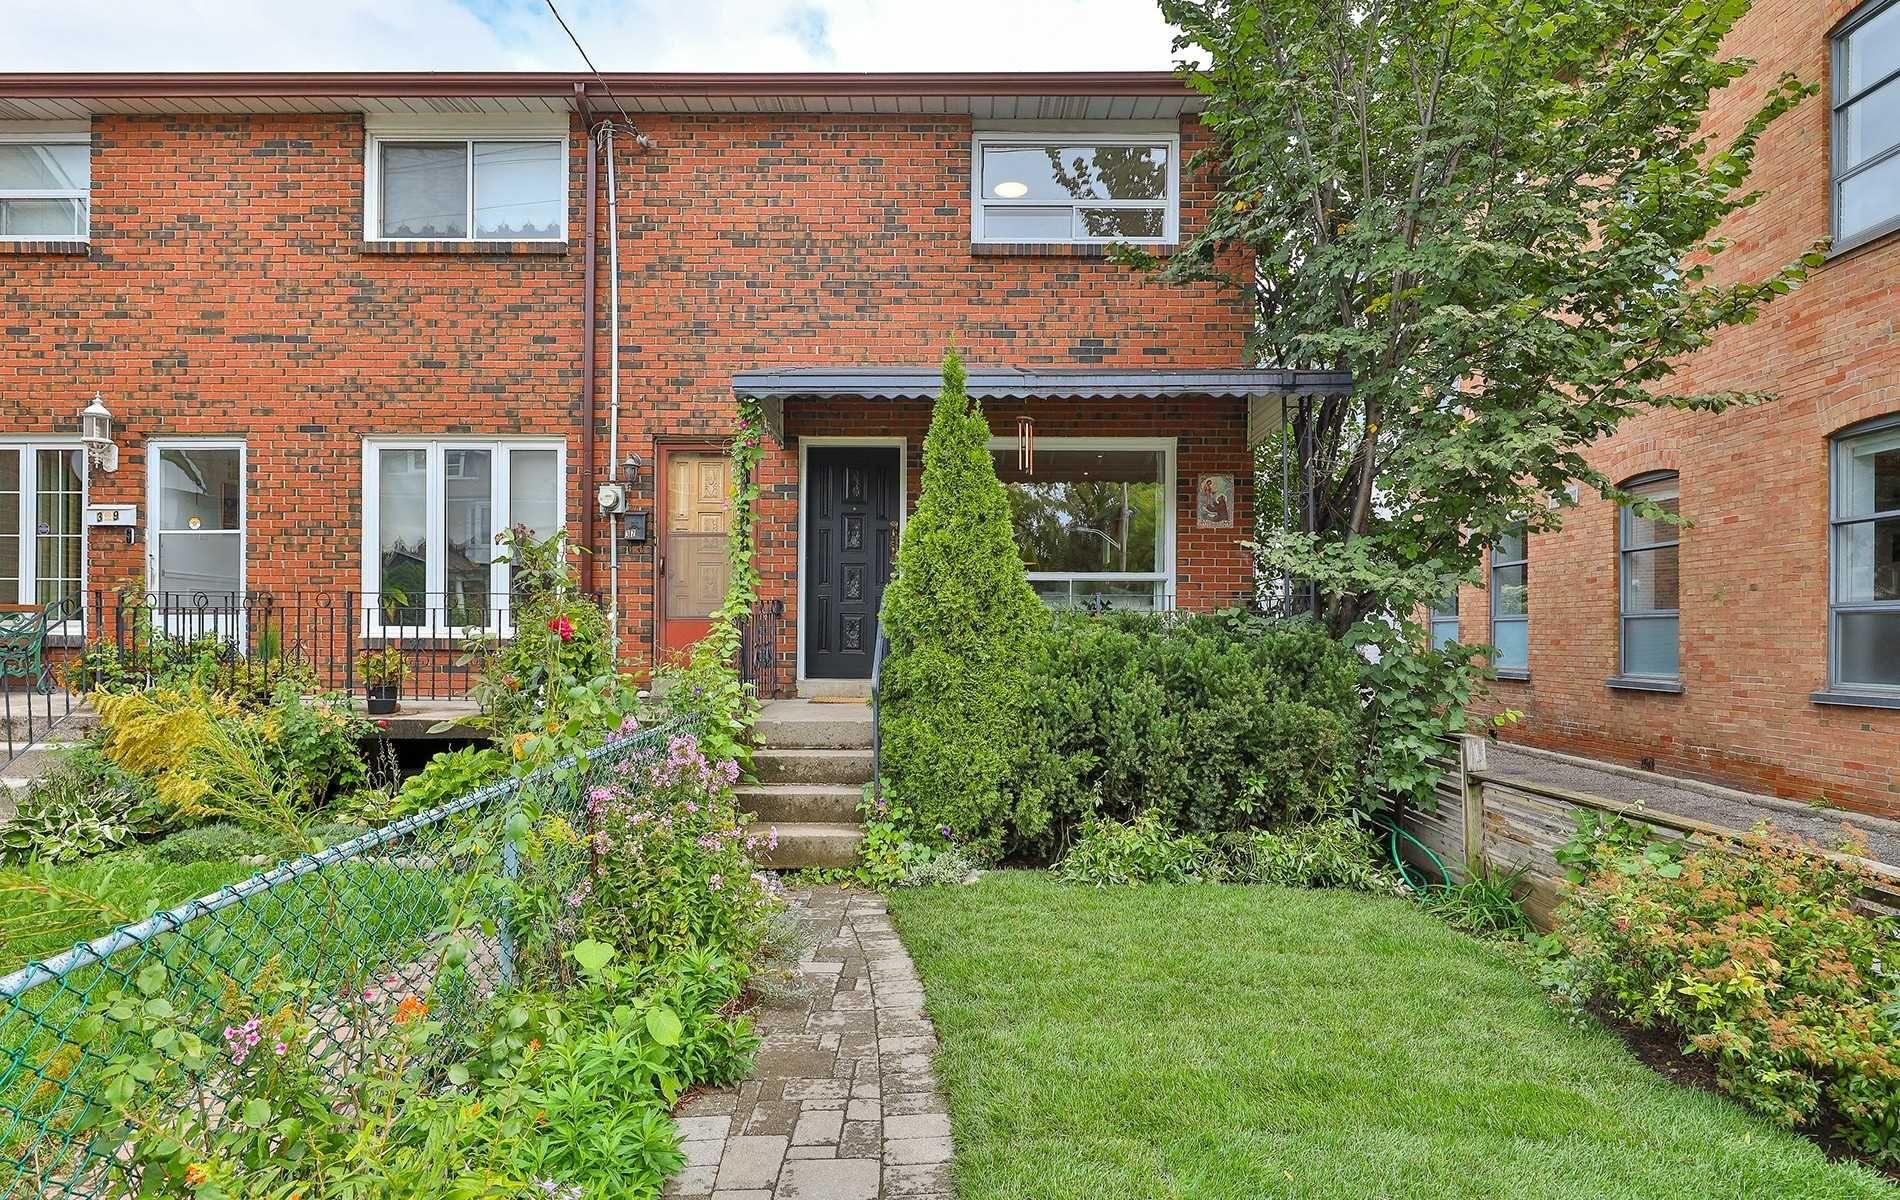 Main Photo: 35 Brock Avenue in Toronto: Roncesvalles House (2-Storey) for sale (Toronto W01)  : MLS®# W5384829